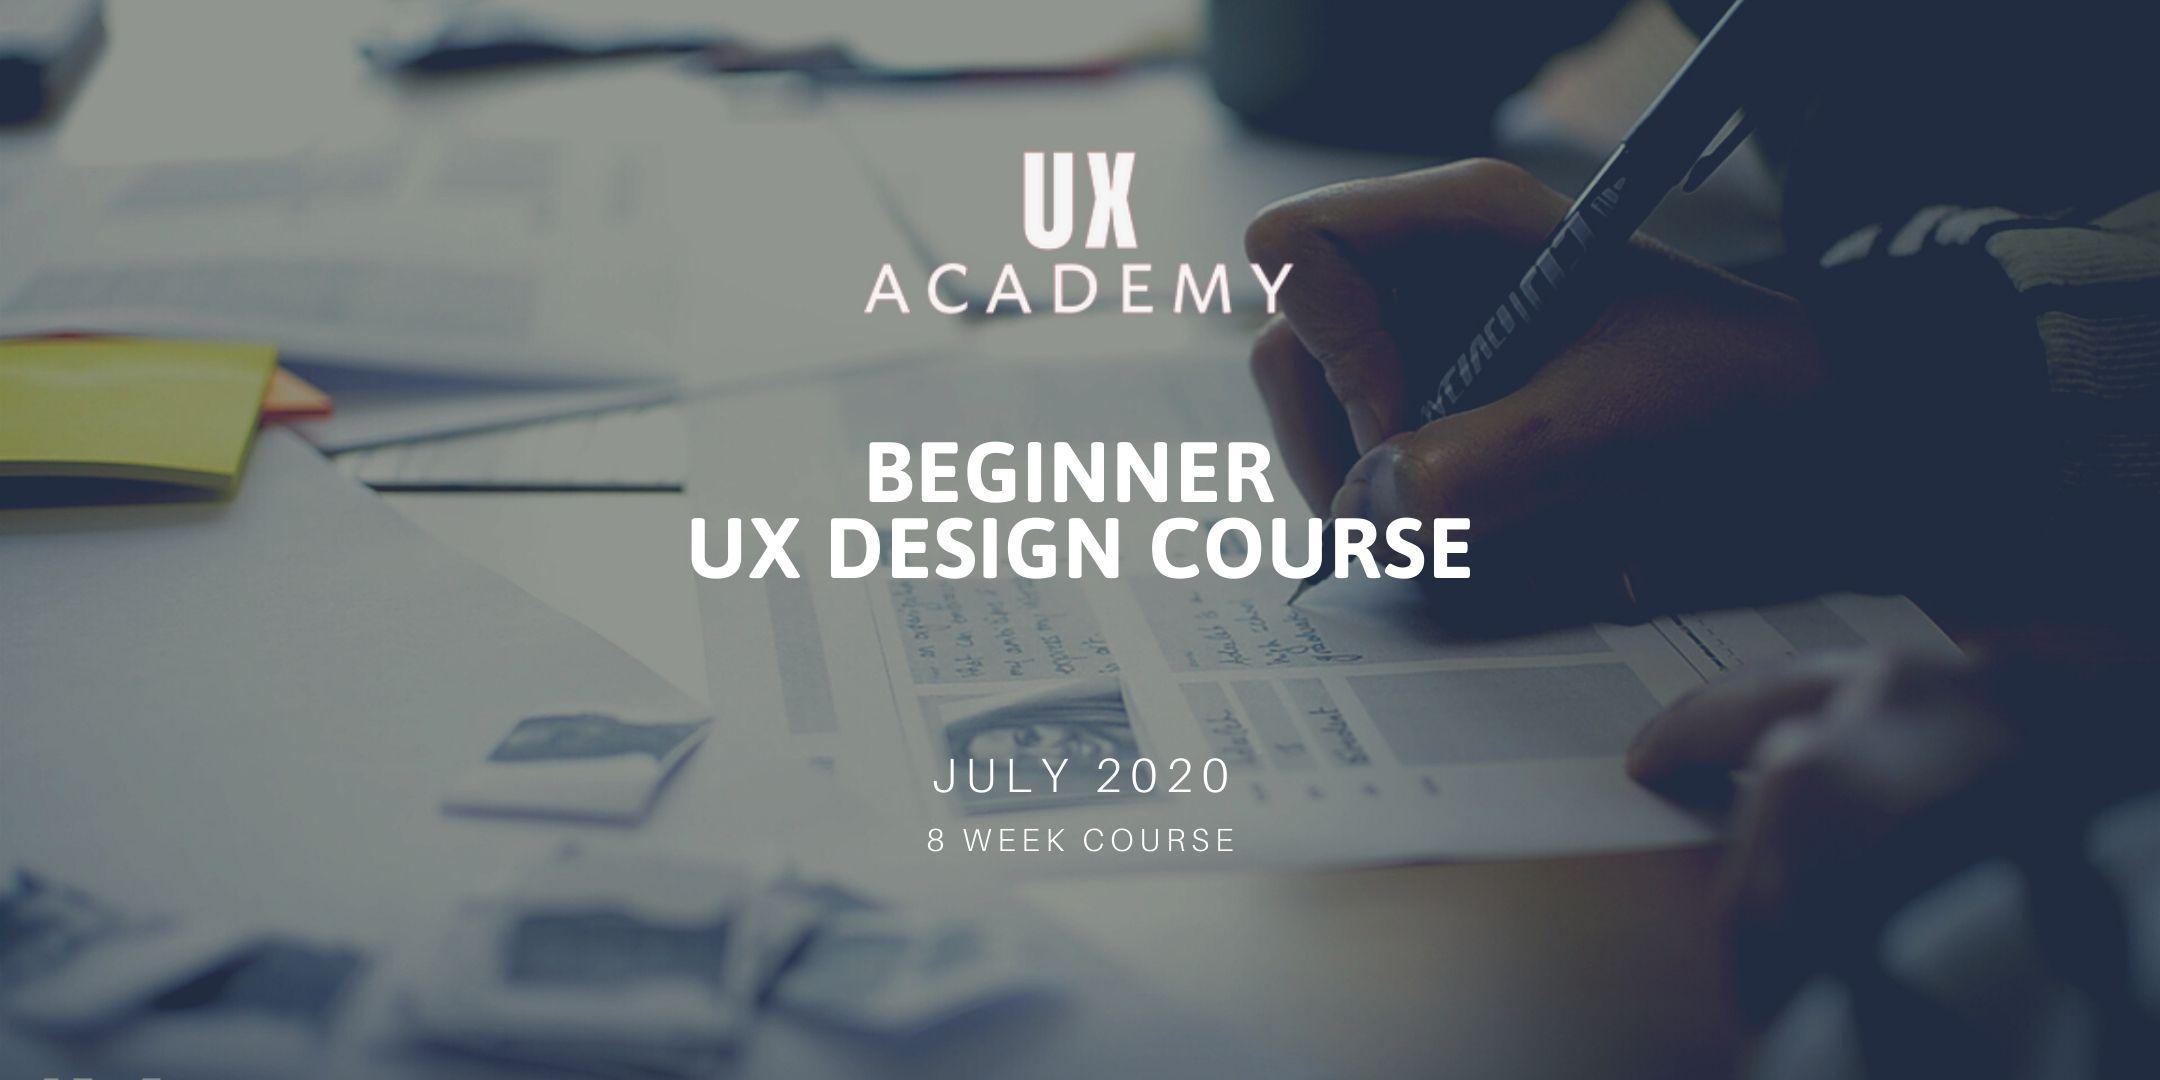 UX Academy Beginner UX Design Course july 2020